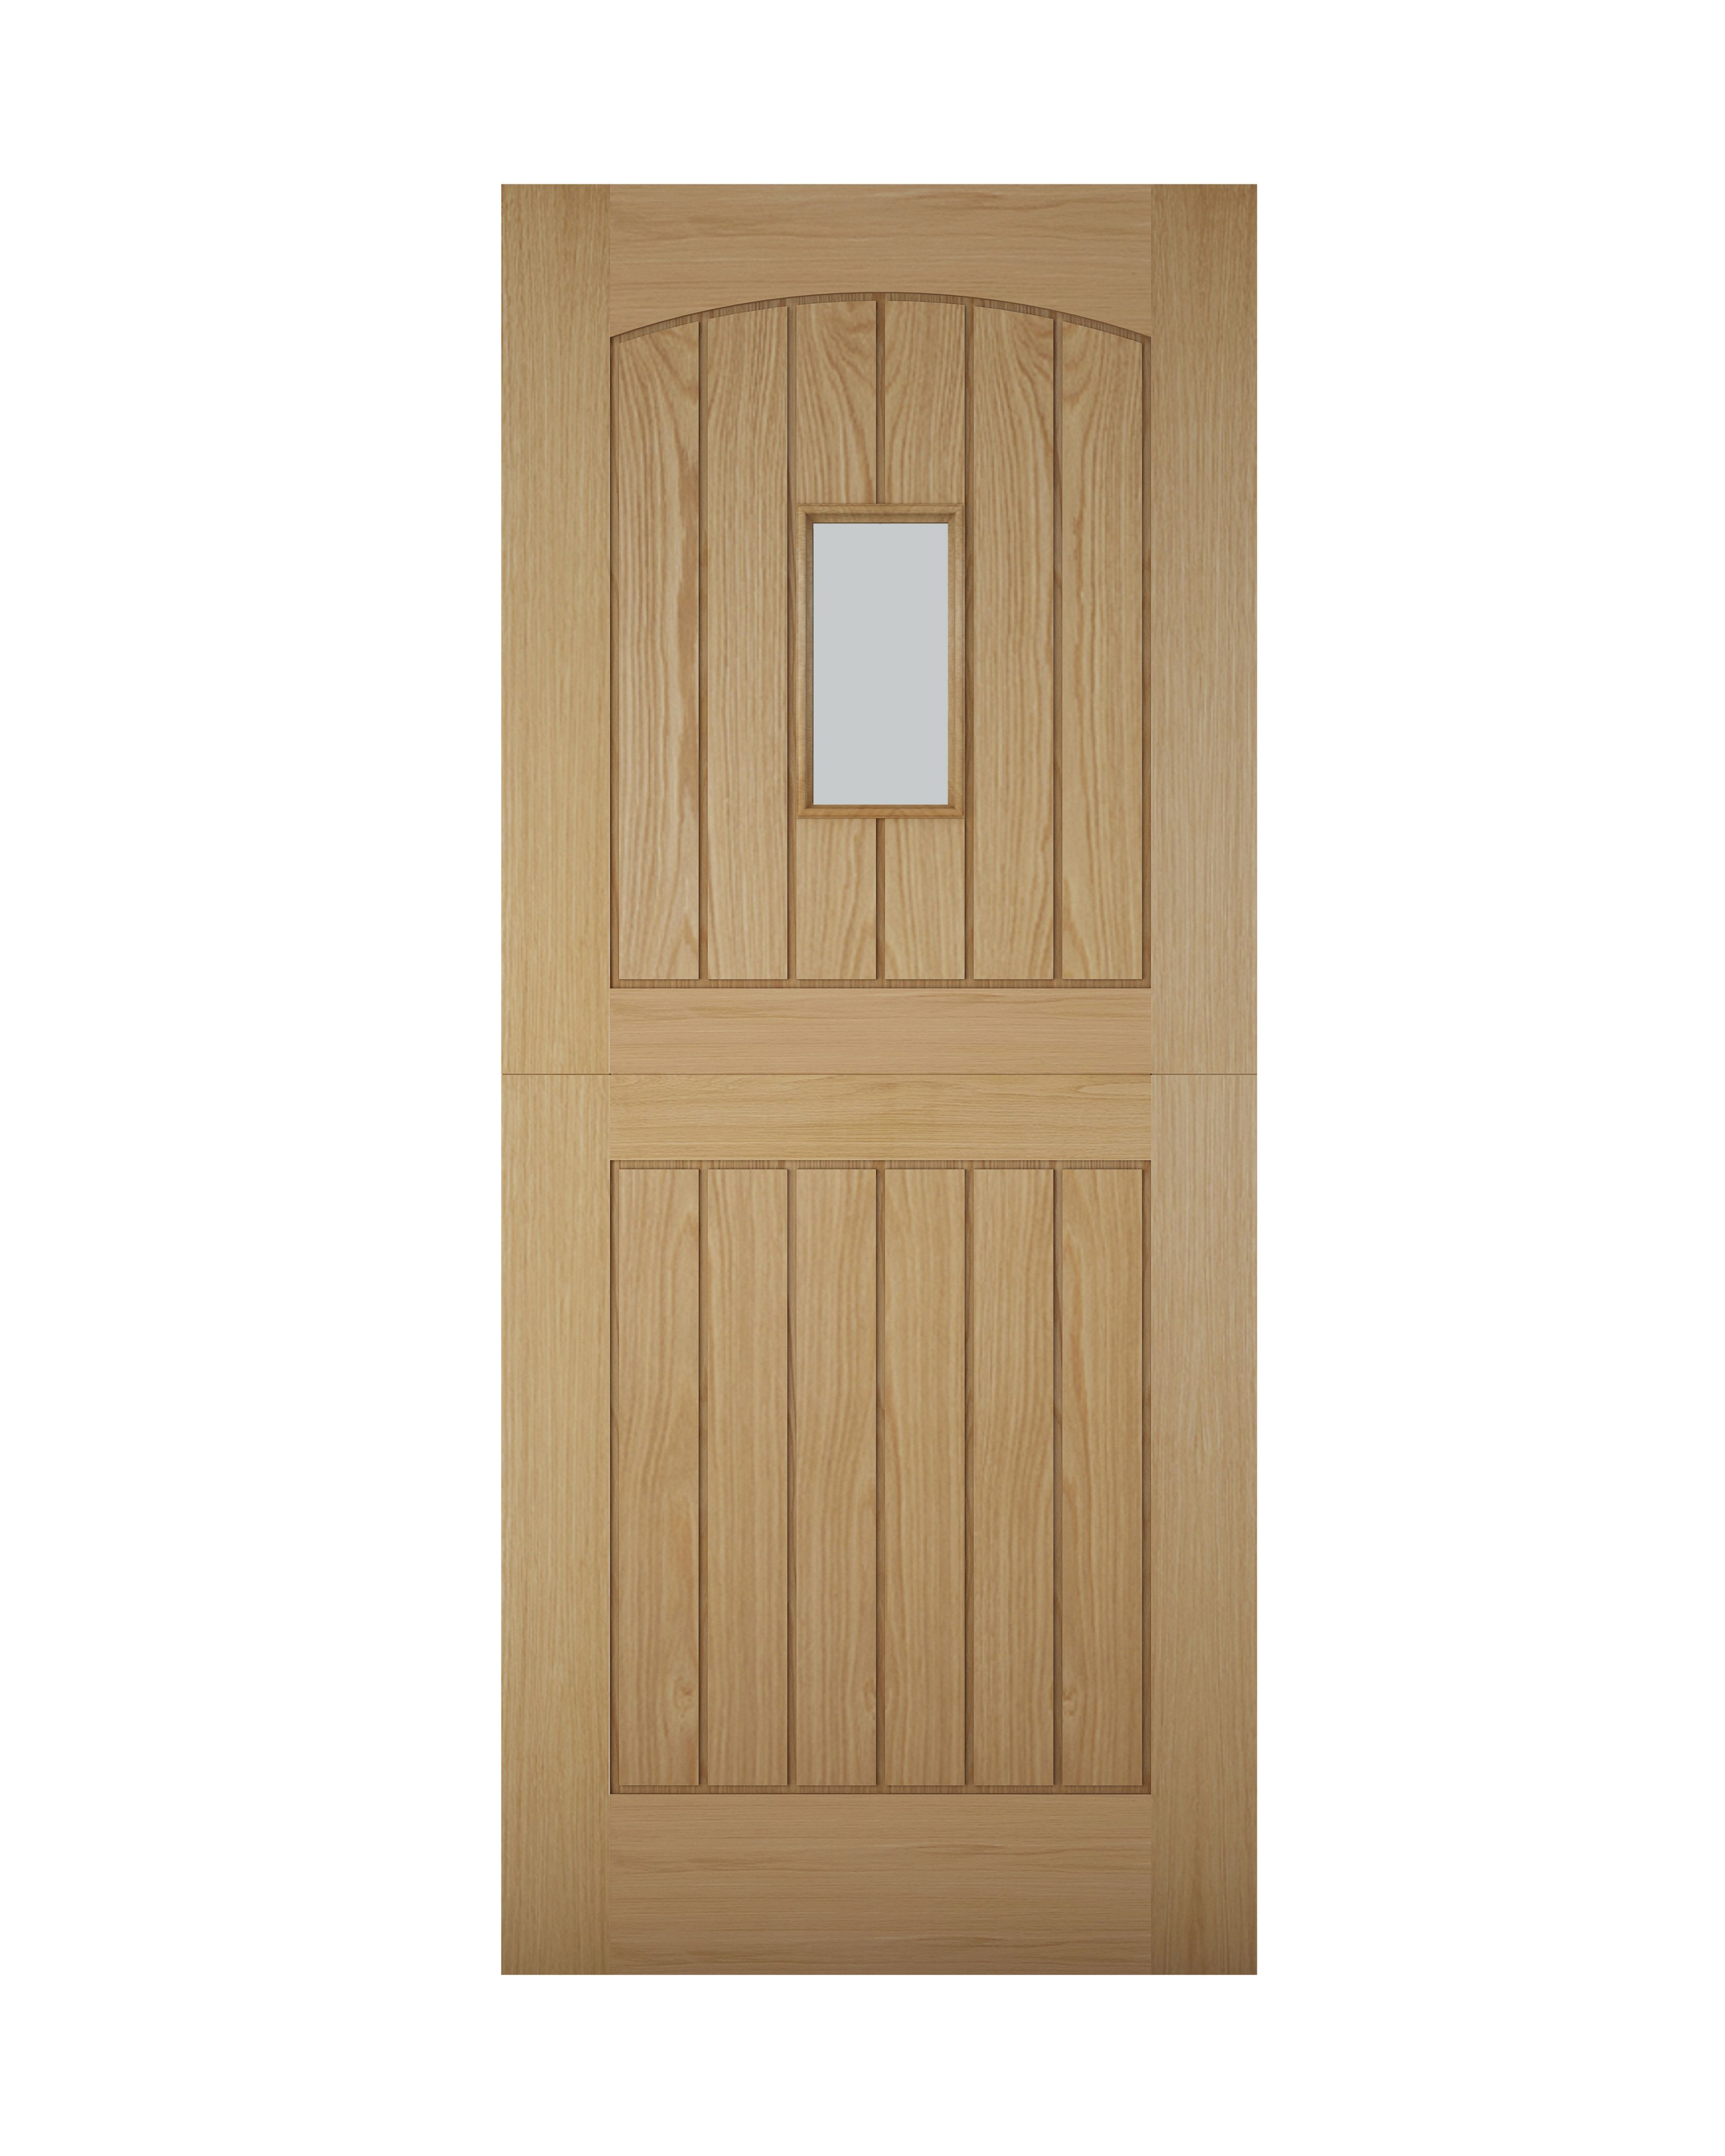 Cottage Stable Panelled White Oak Veneer Glazed Front Door, (h)1981mm (w)762mm